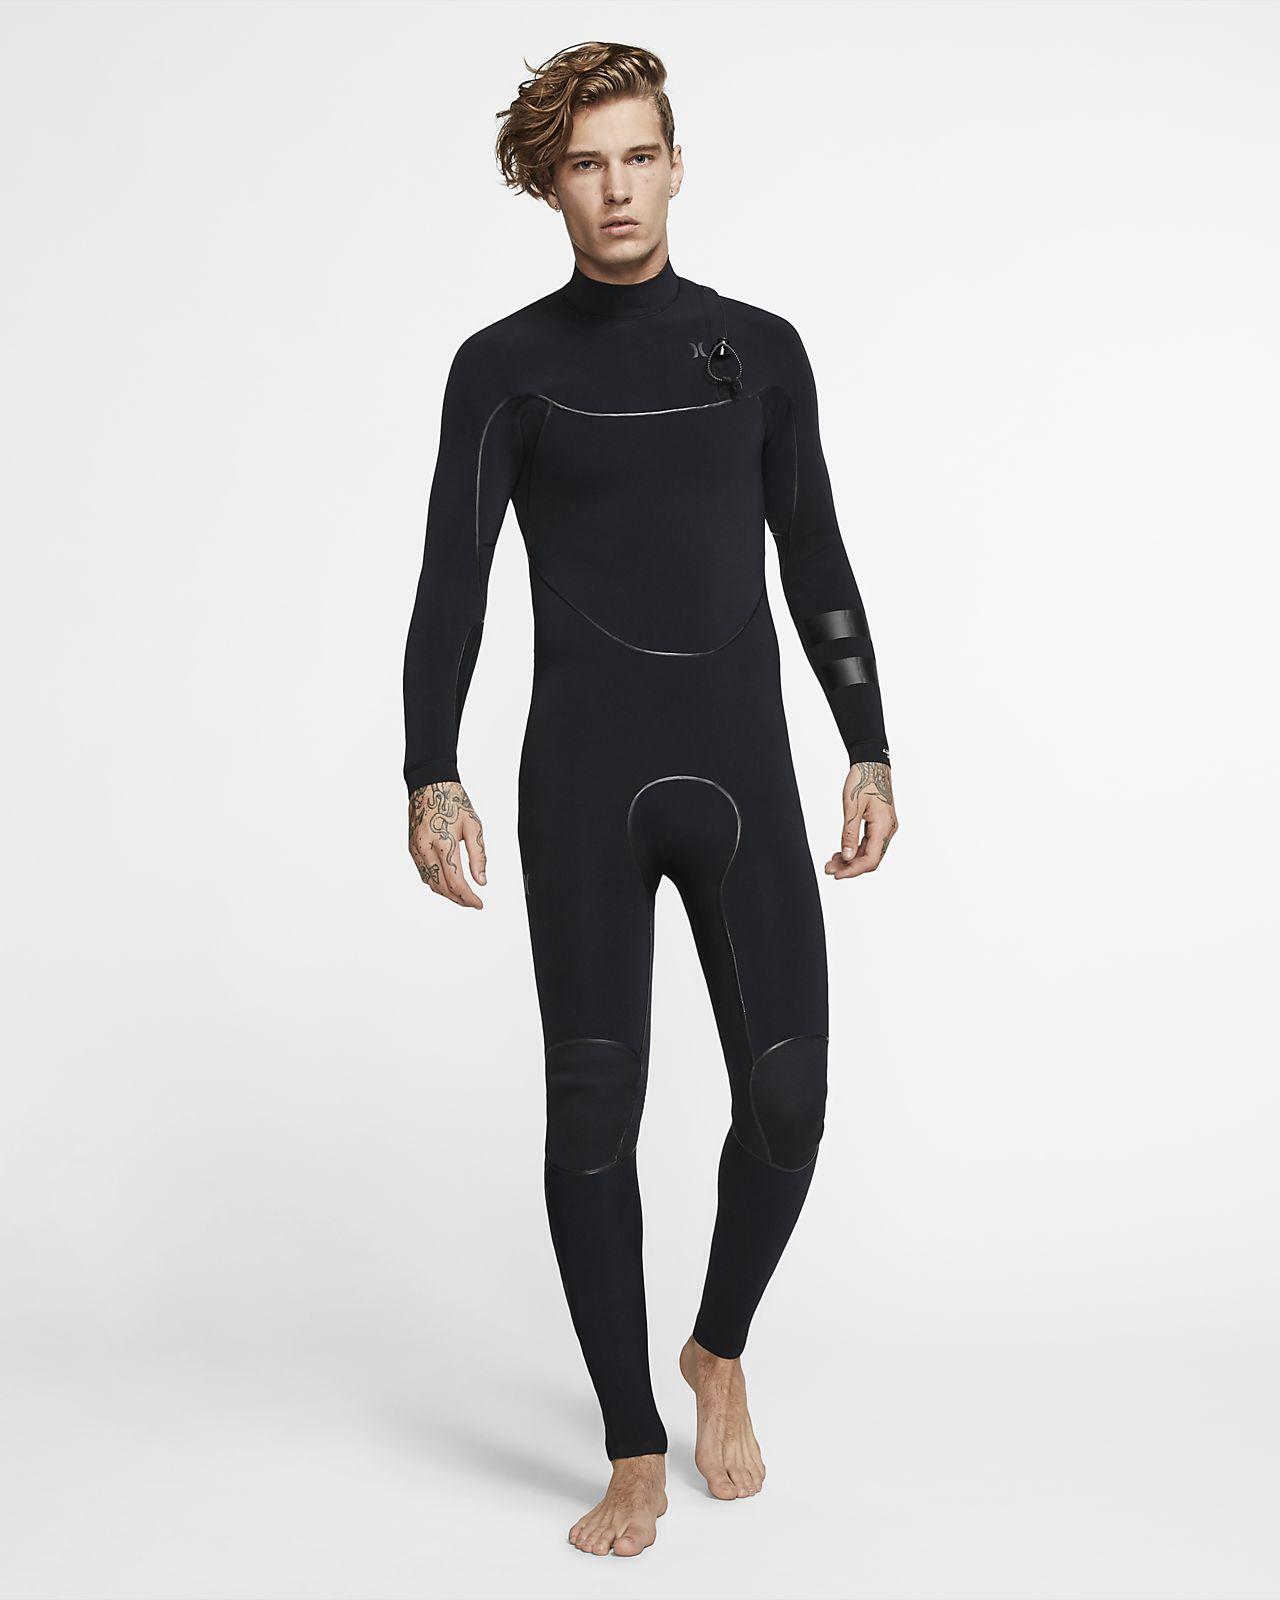 Pánský neoprenový oblek Hurley Advantage Max 4/3 Fullsuit